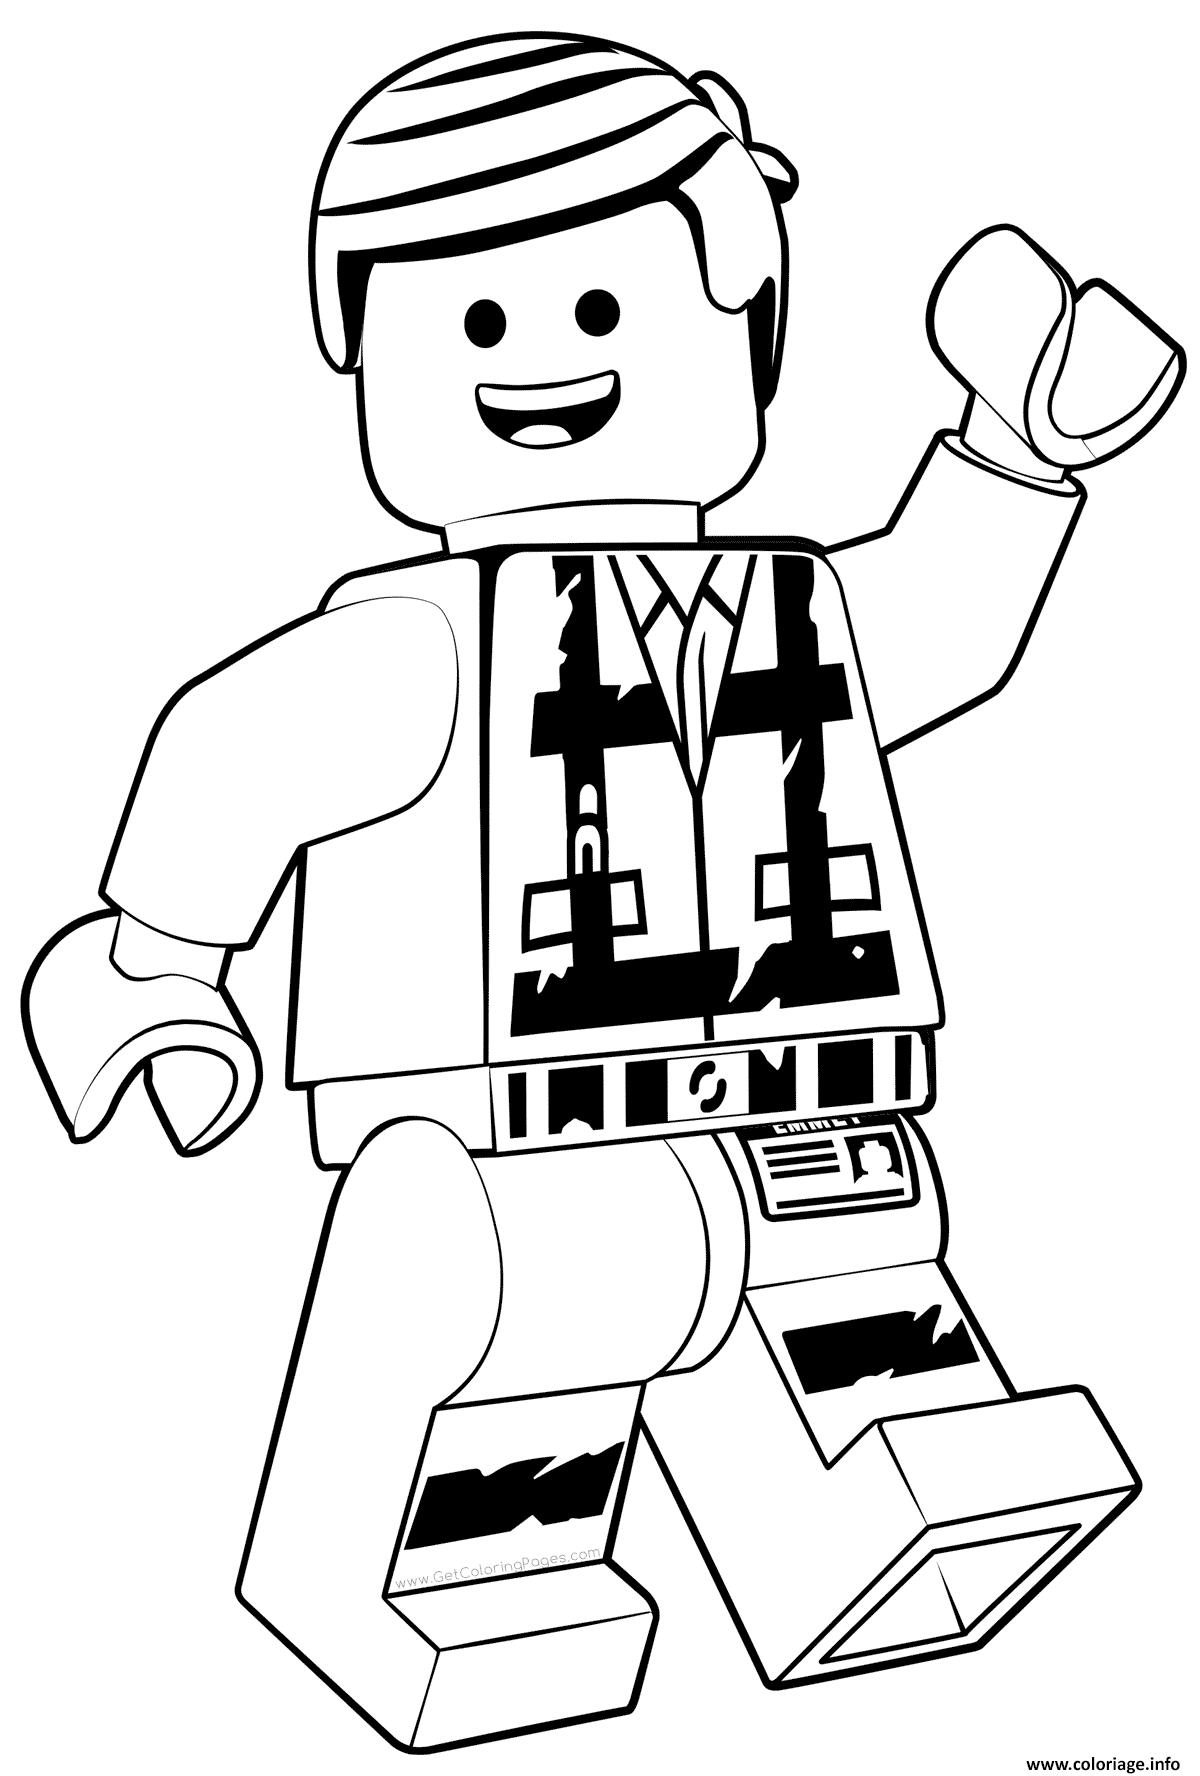 Coloriage A Imprimer Lego 2.Coloriage Lego Emmet La Grande Aventure 2 Jecolorie Com